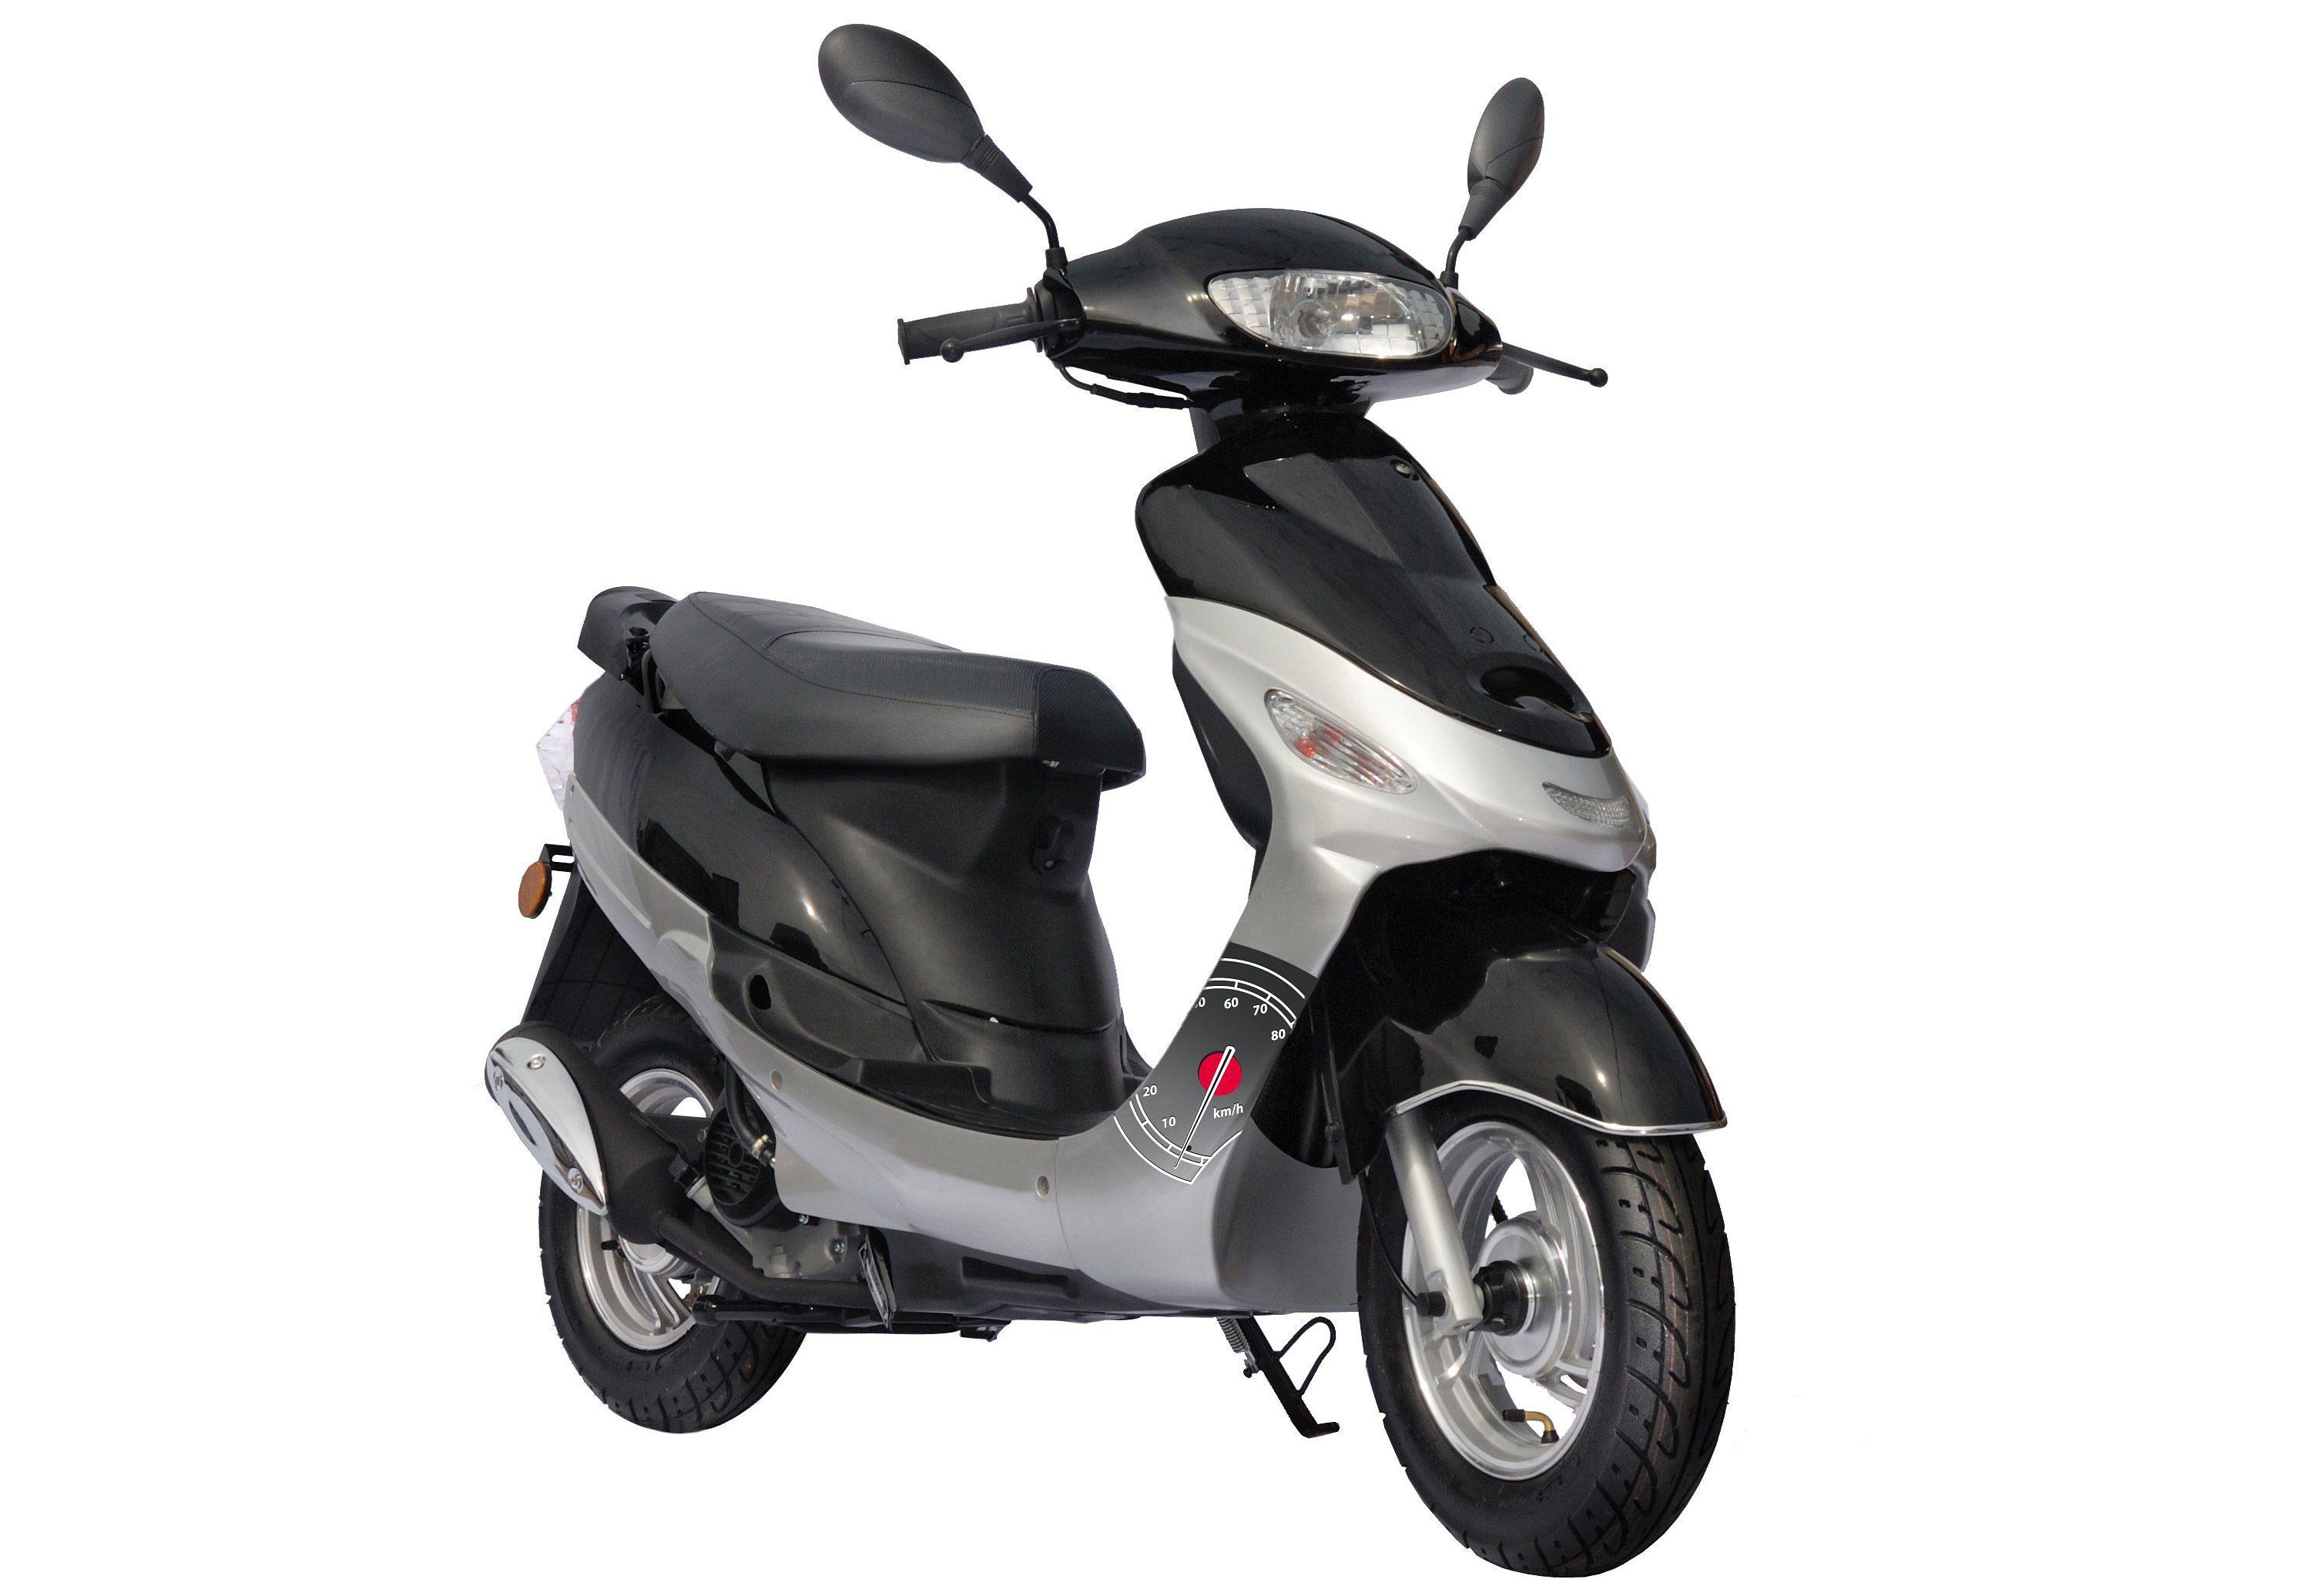 Mofaroller inkl. Spiegel, Nova Motors, »Eco Fox«, 49-ccm, 25 km/h